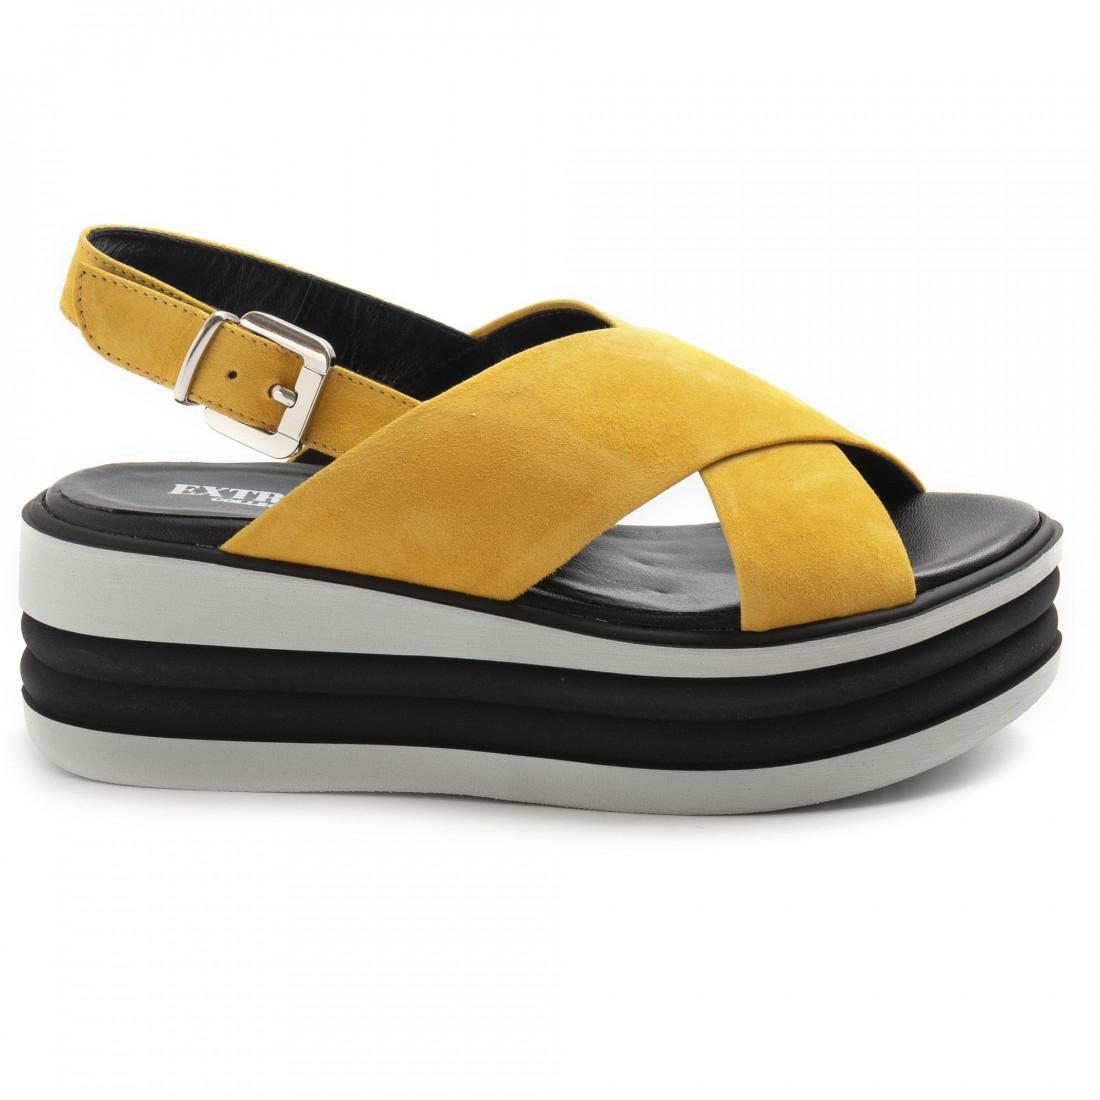 sandalen damen extreme 2801foxcamoscio ocra 8579